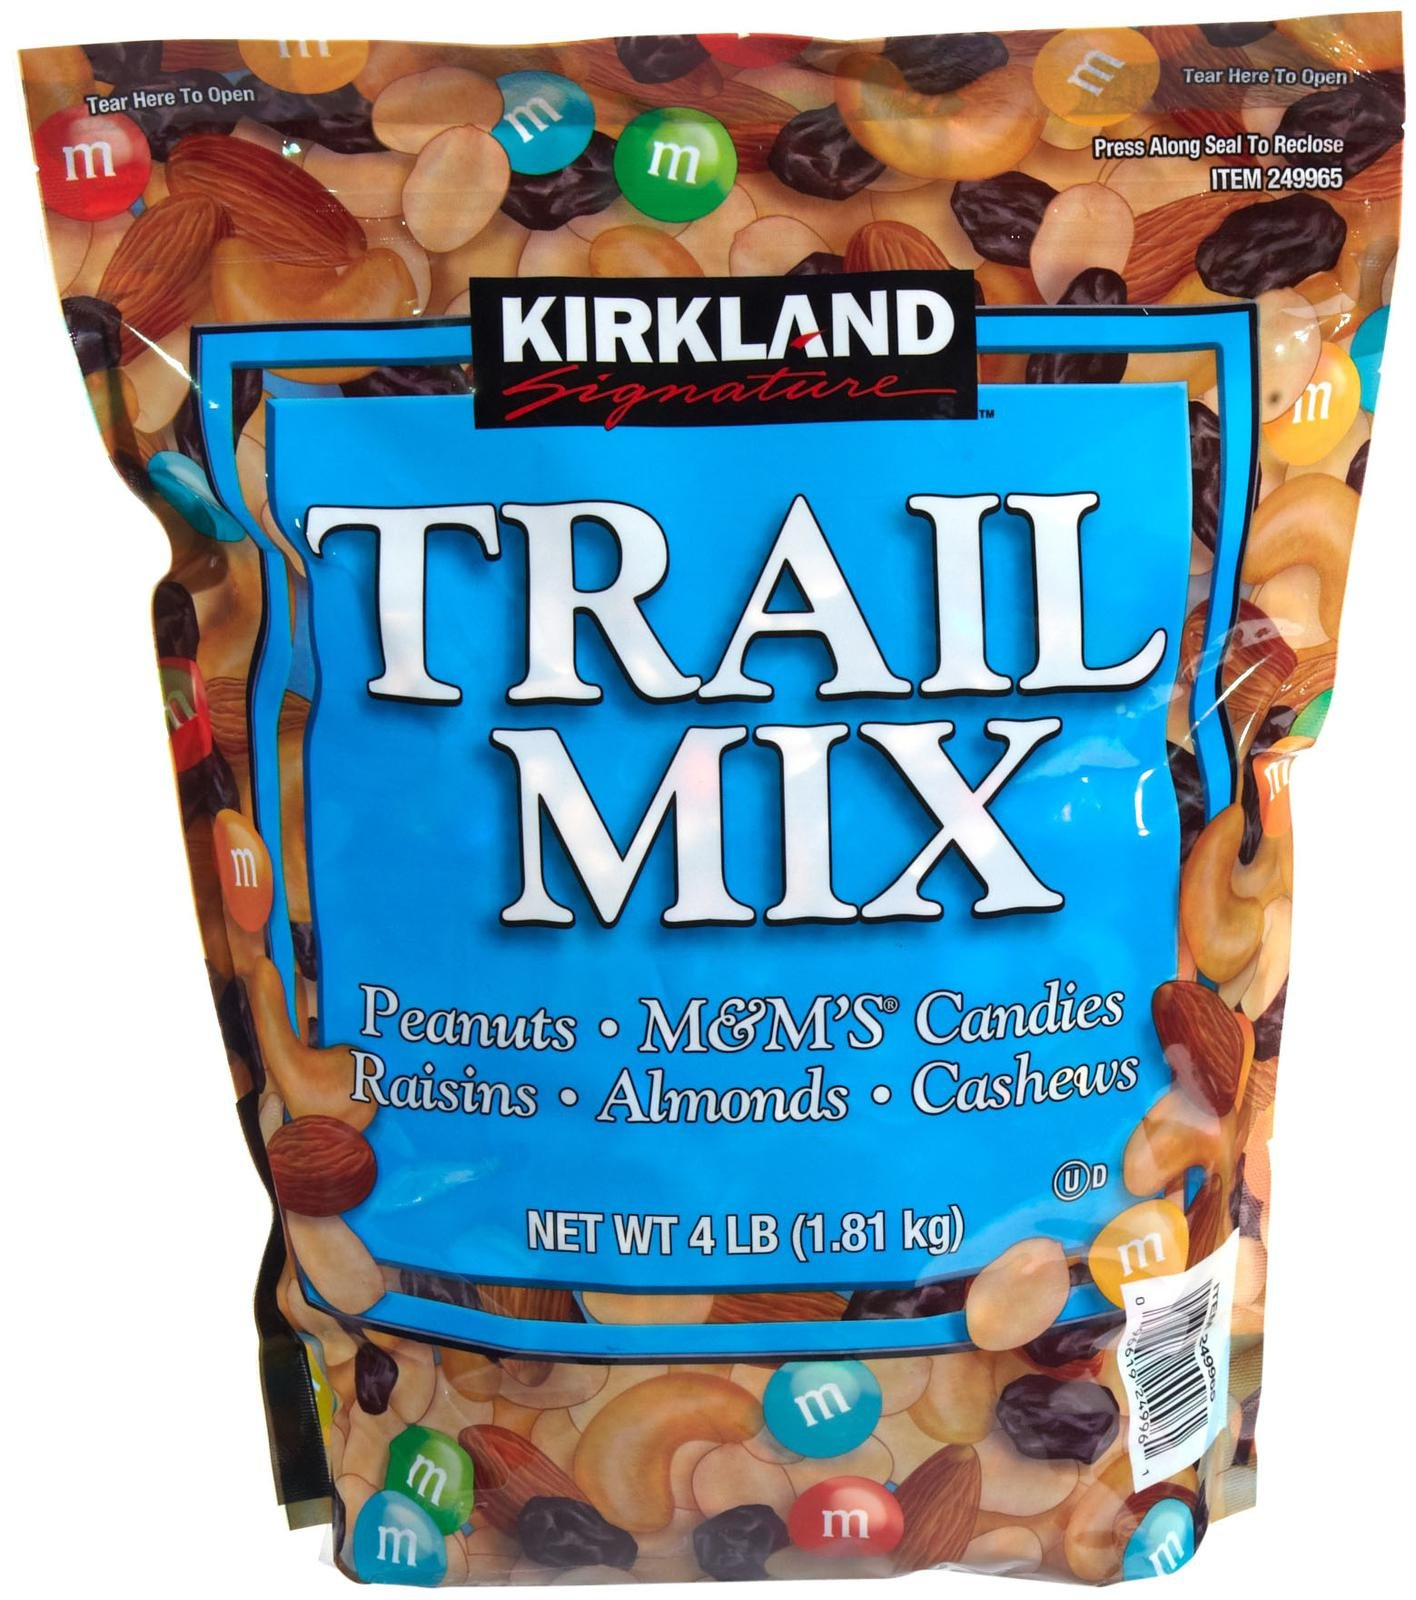 Kirkland Signature Trail Mix Value Size, Ideal Snack Food, 4 lb